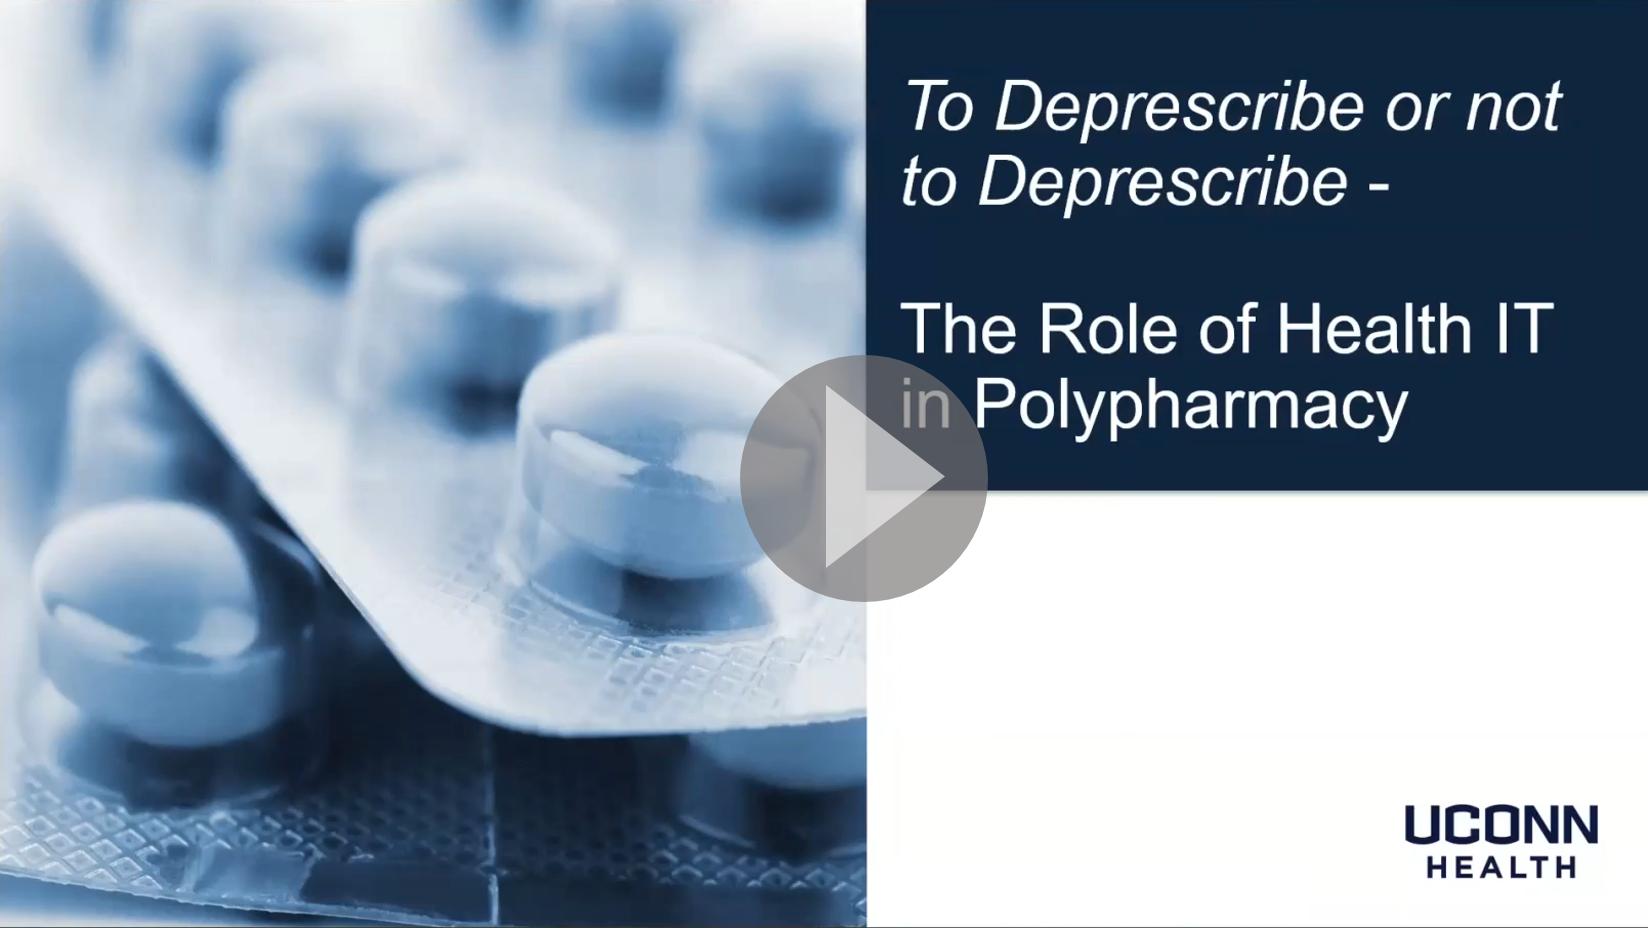 To Deprescribe or Not to Deprescribe intro slide